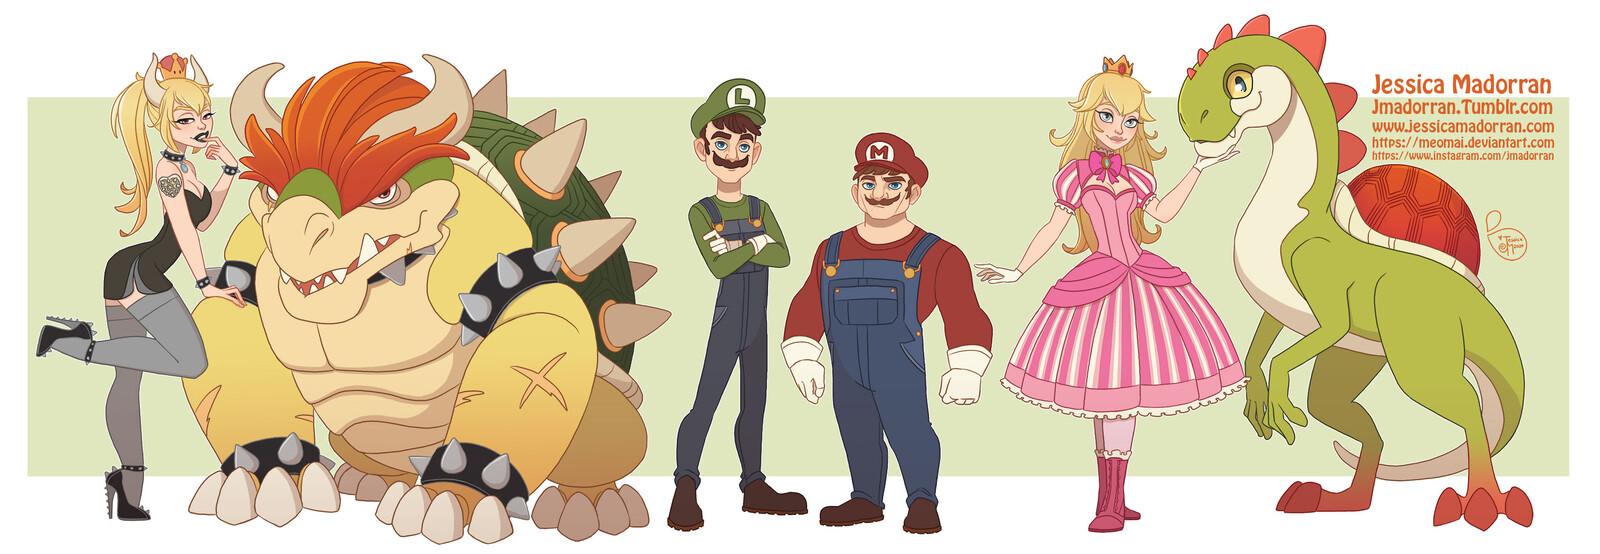 Patreon - Character Line Up - Super Mario Bros Fan Art